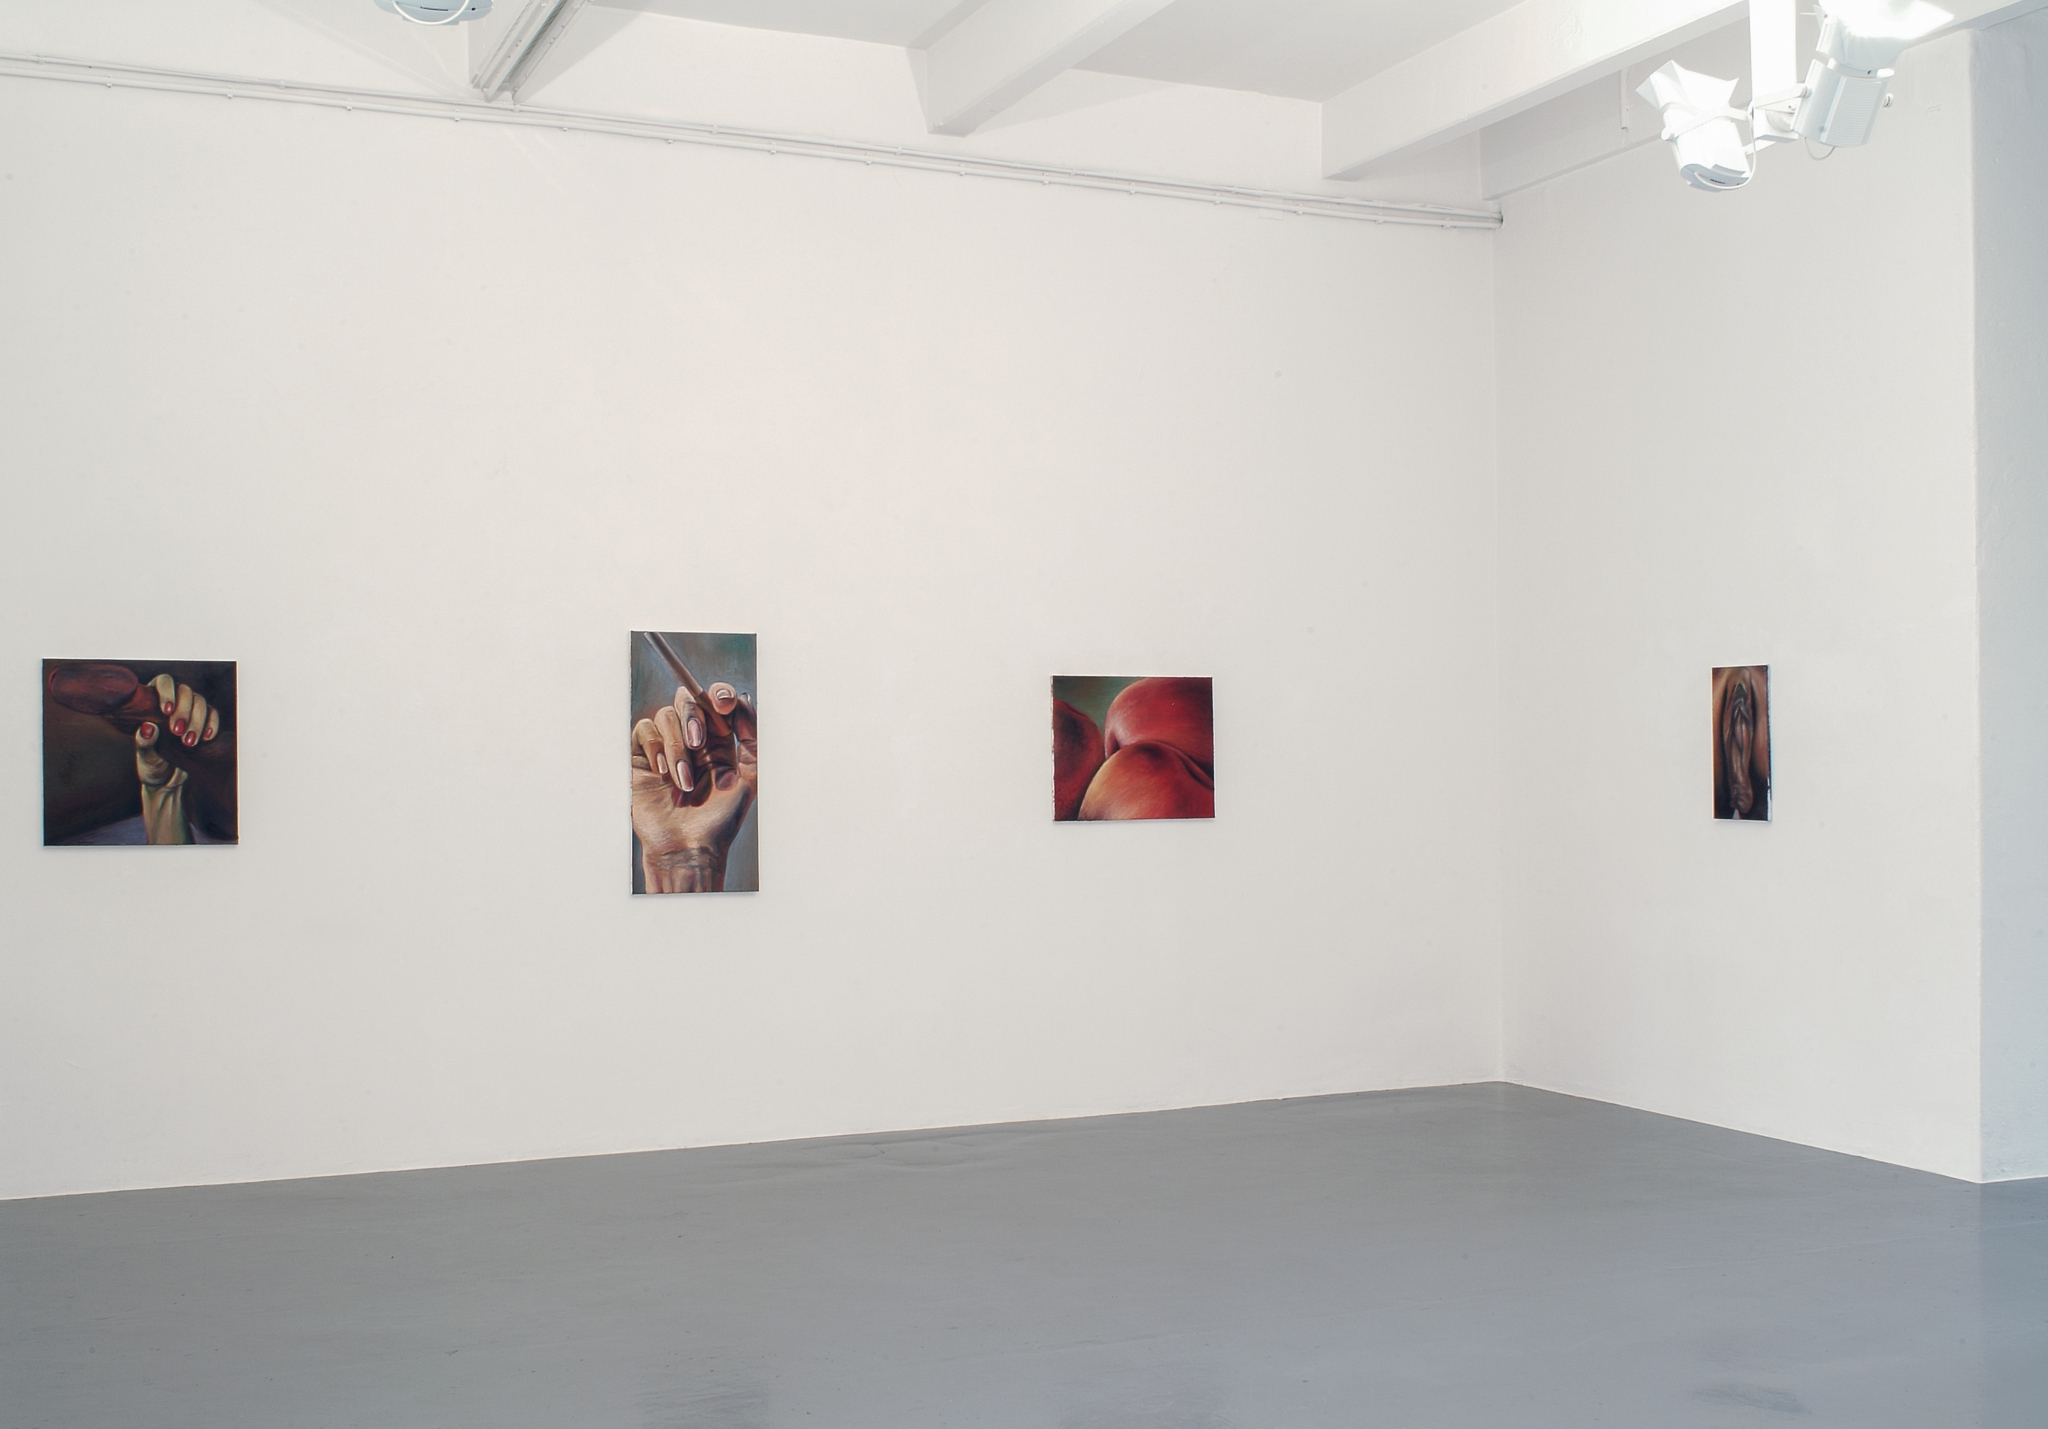 Ina_van_Zyl_-Galerie-Onrust-EX-three-crowd04.jpg